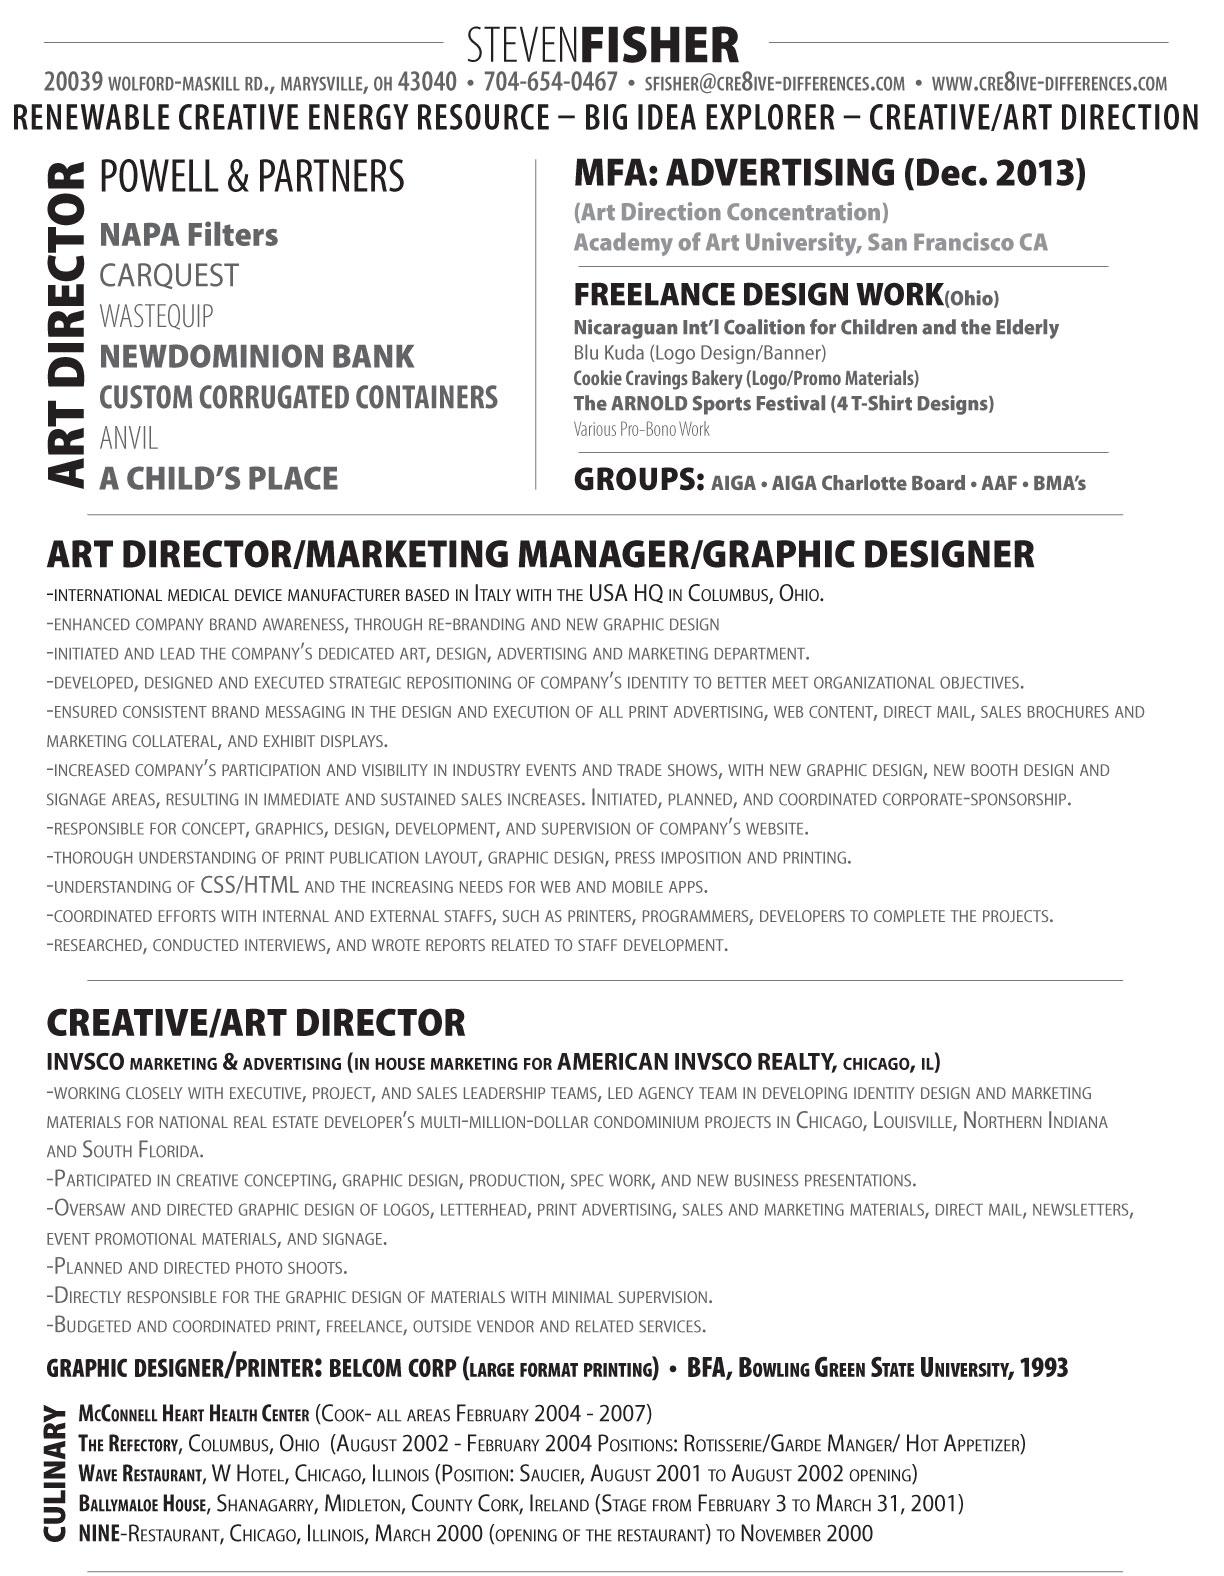 steven fisher art director cv creive differences llc steven fisher art director cv 2013